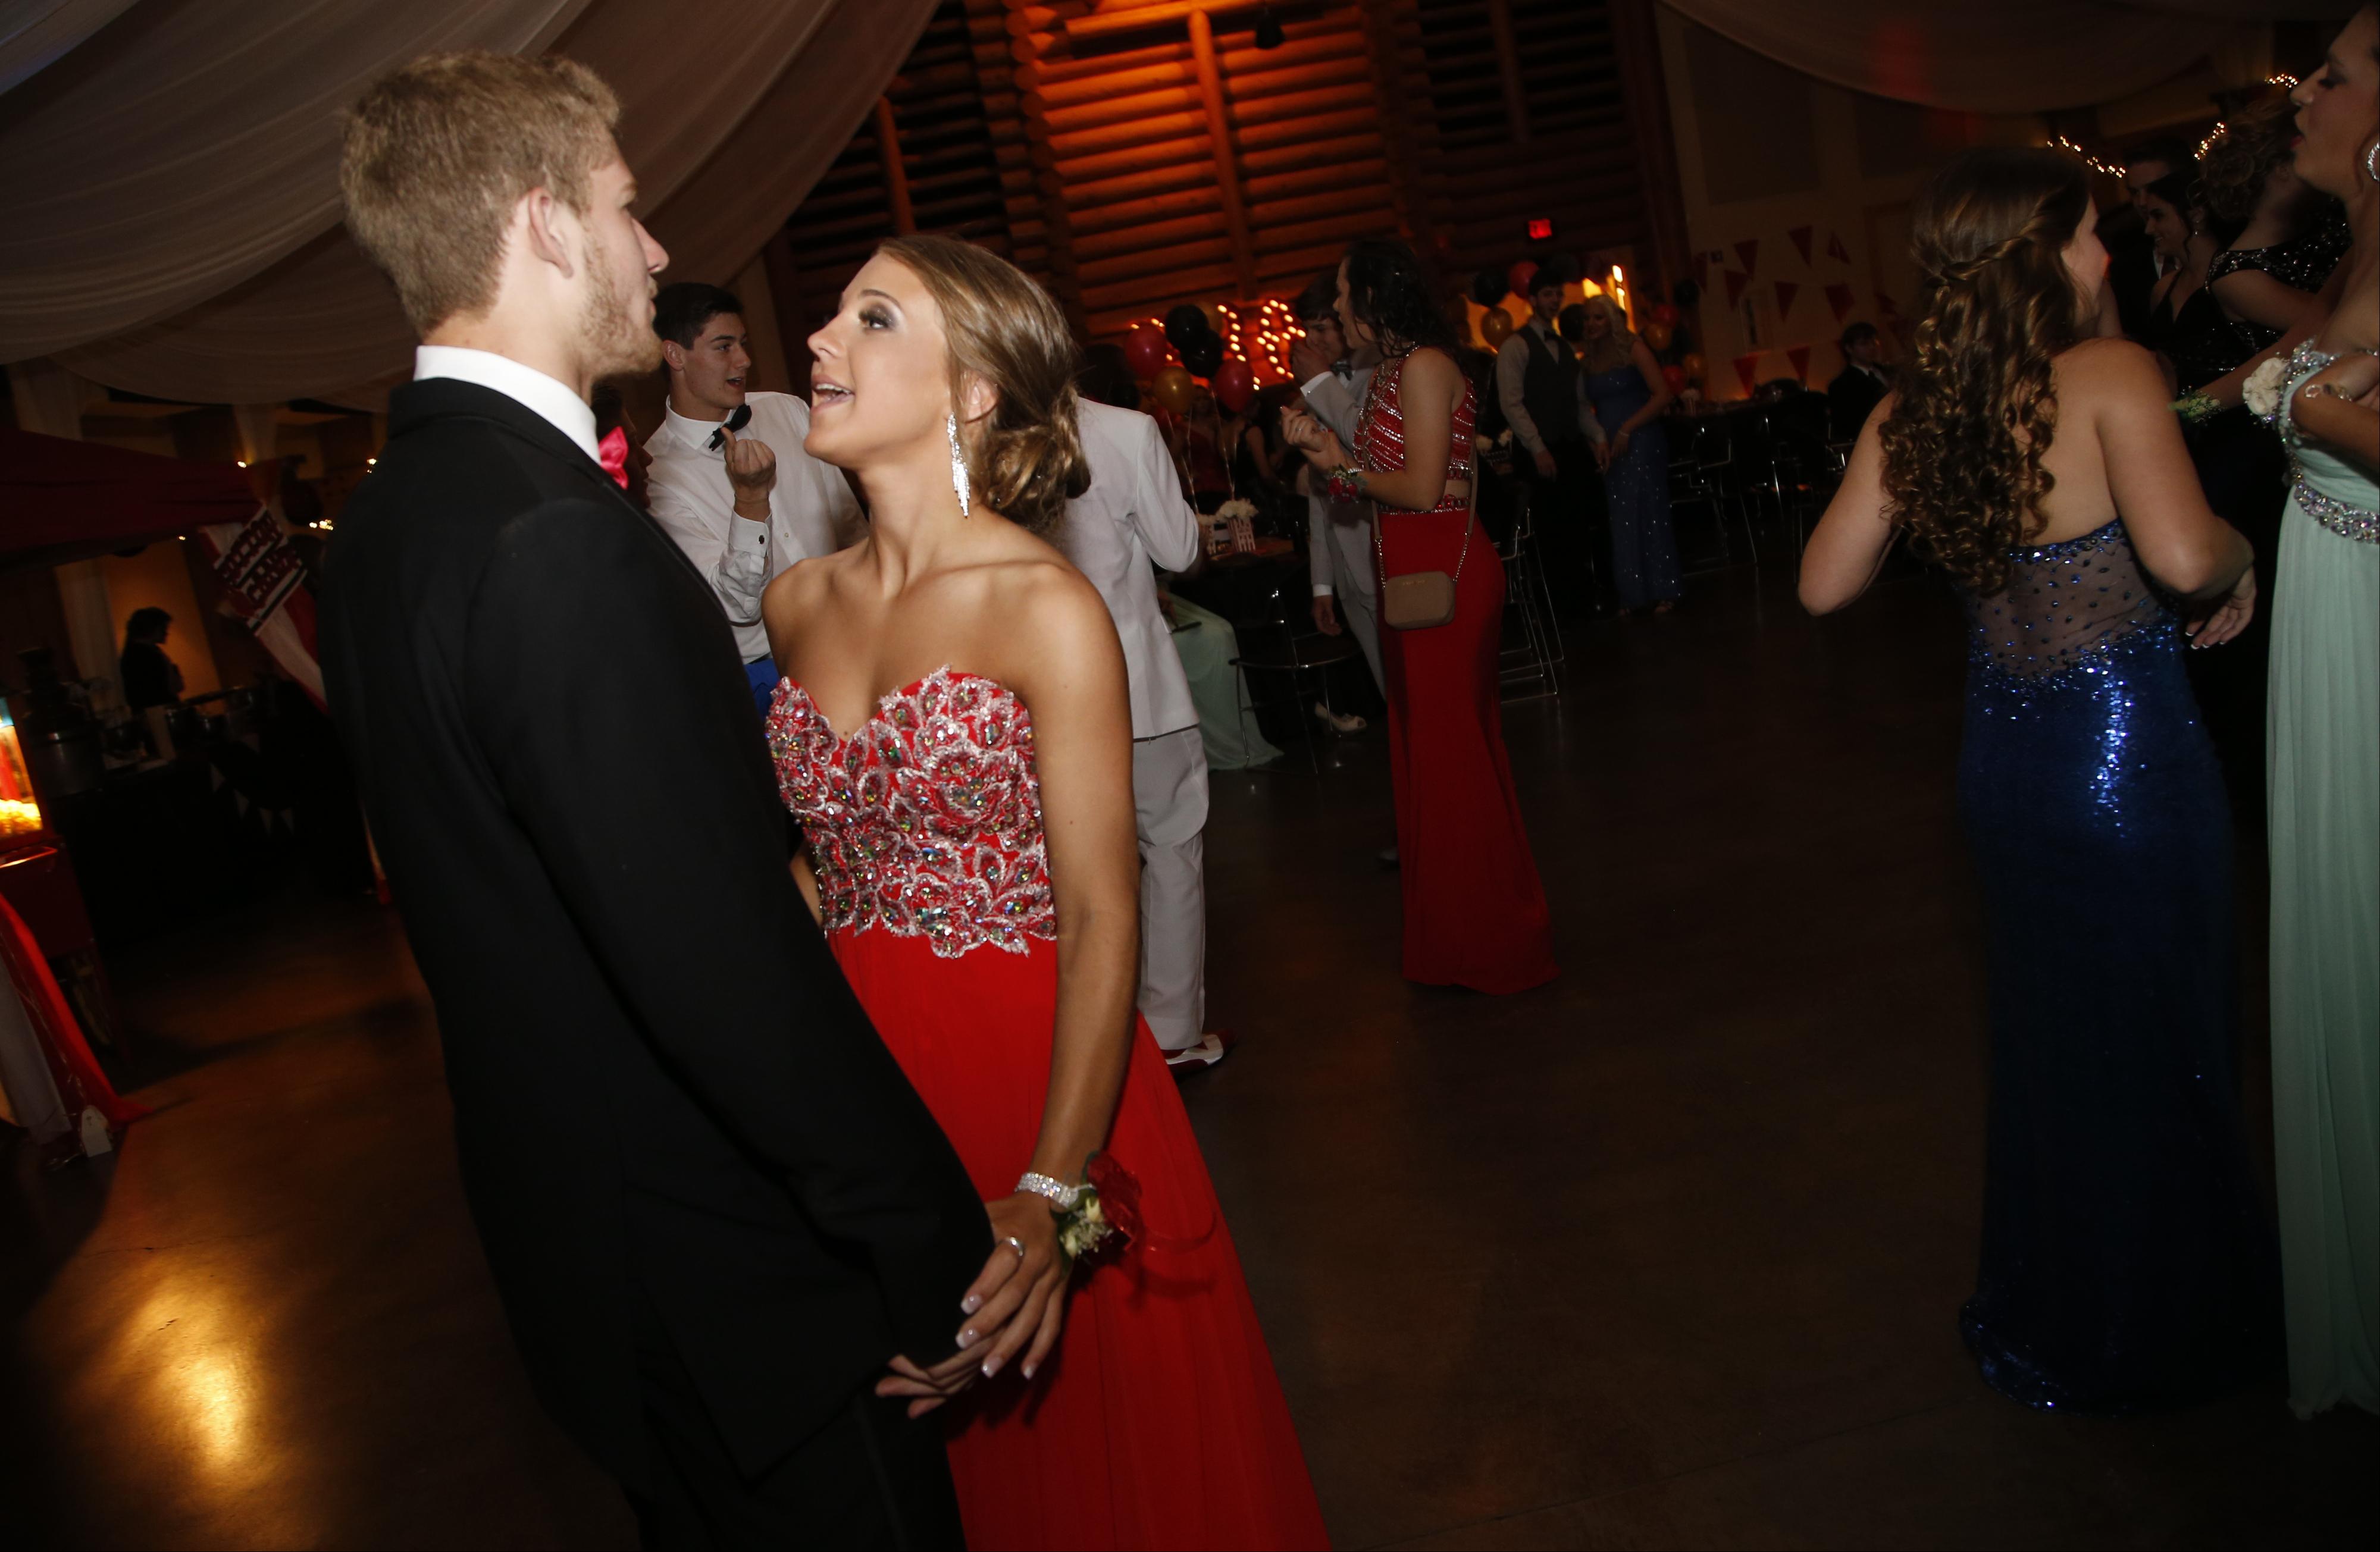 Photo Gallery - Berryhill High School prom night at Camp Loughridge